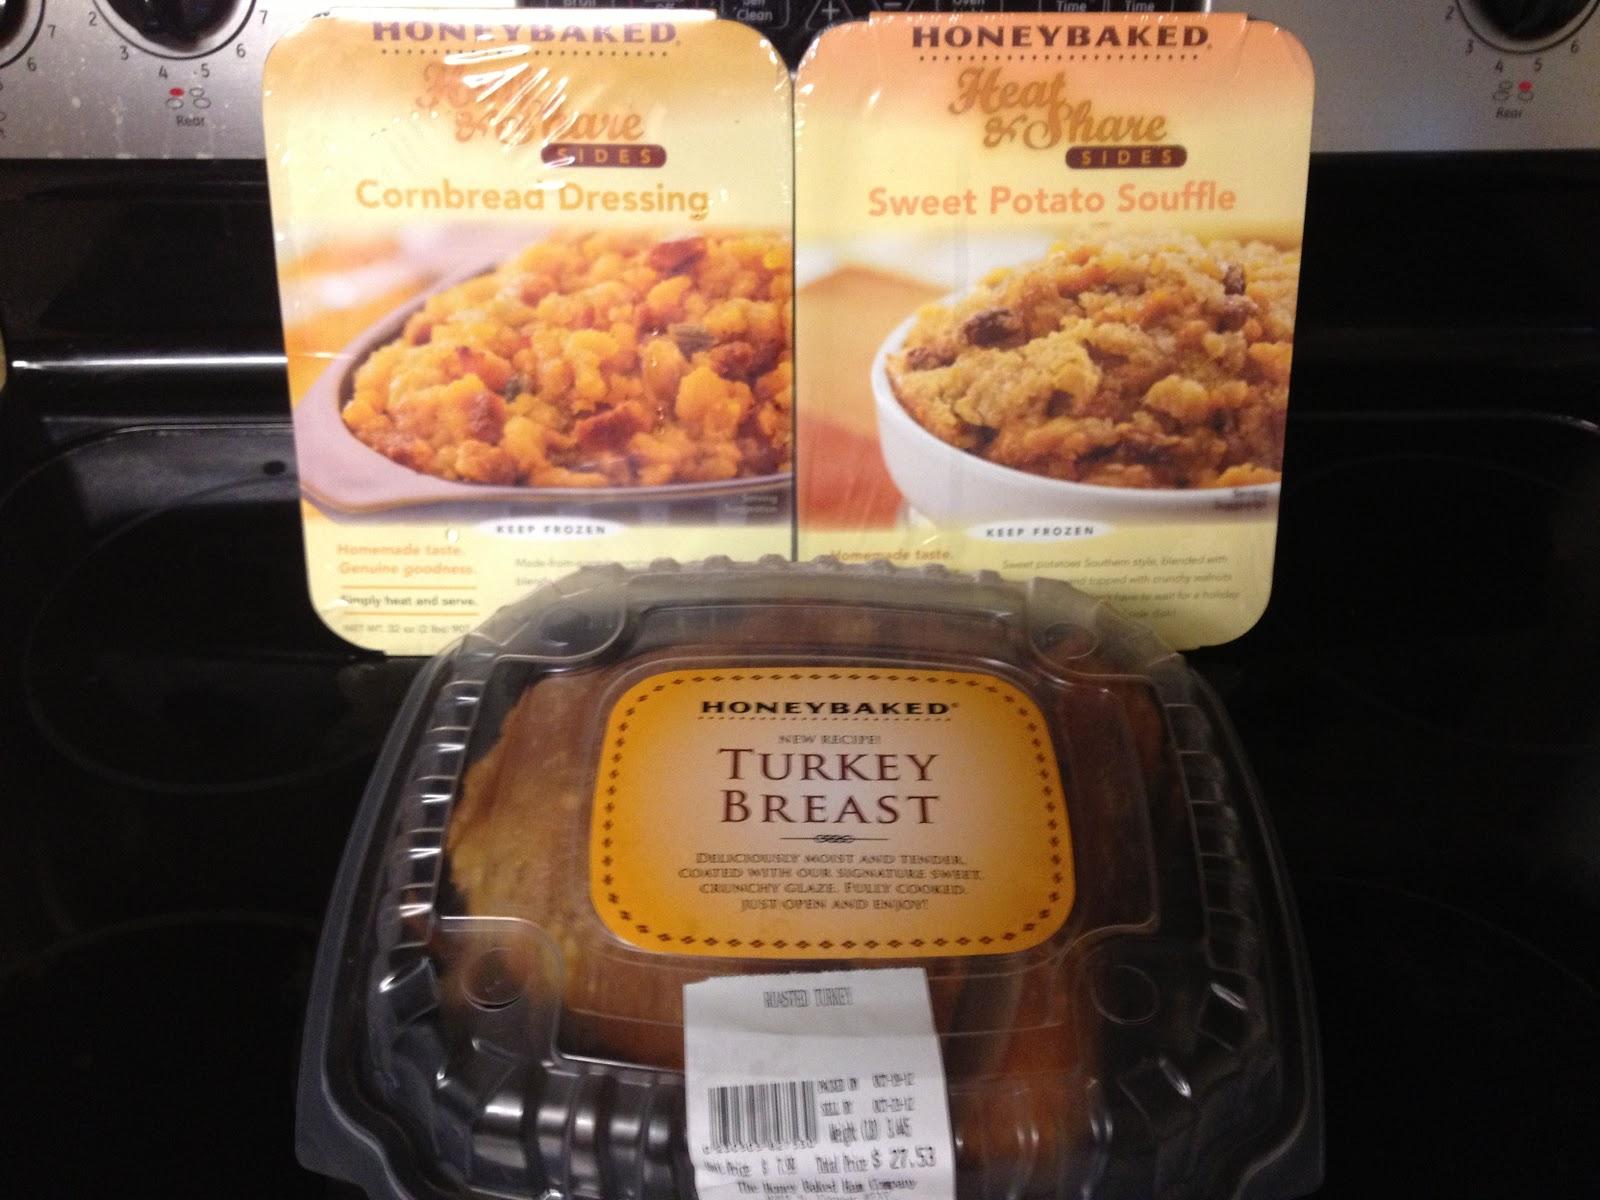 Honeybaked Ham Turkey Breast Review Just Marla